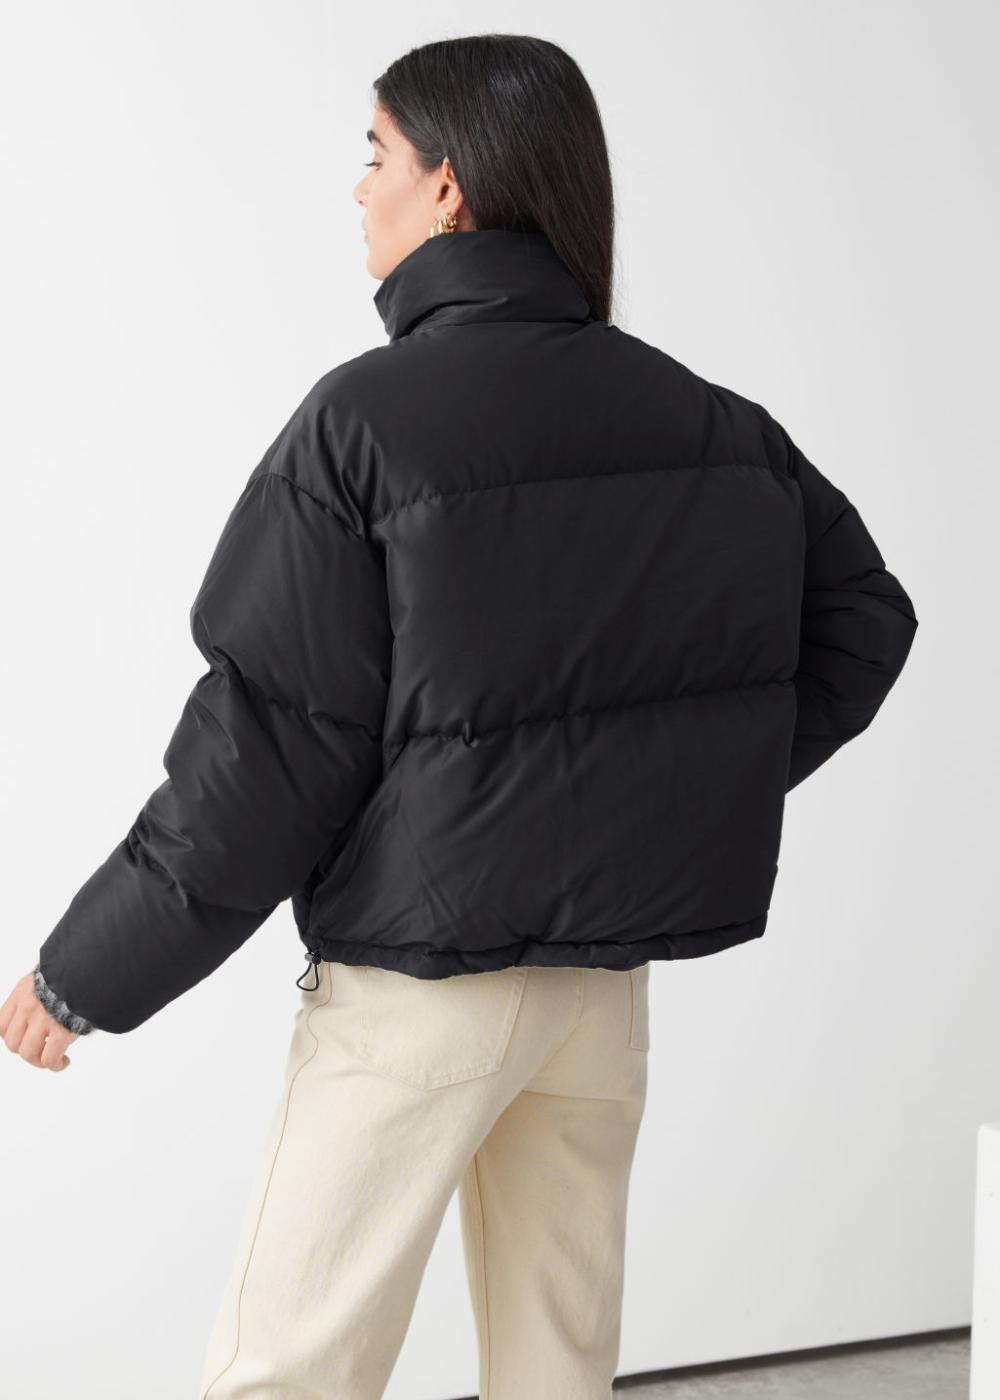 Short Oversized Puffer Jacket Puffer Jacket Women Winter Jacket Outfits North Face Puffer Jacket [ 1400 x 1000 Pixel ]